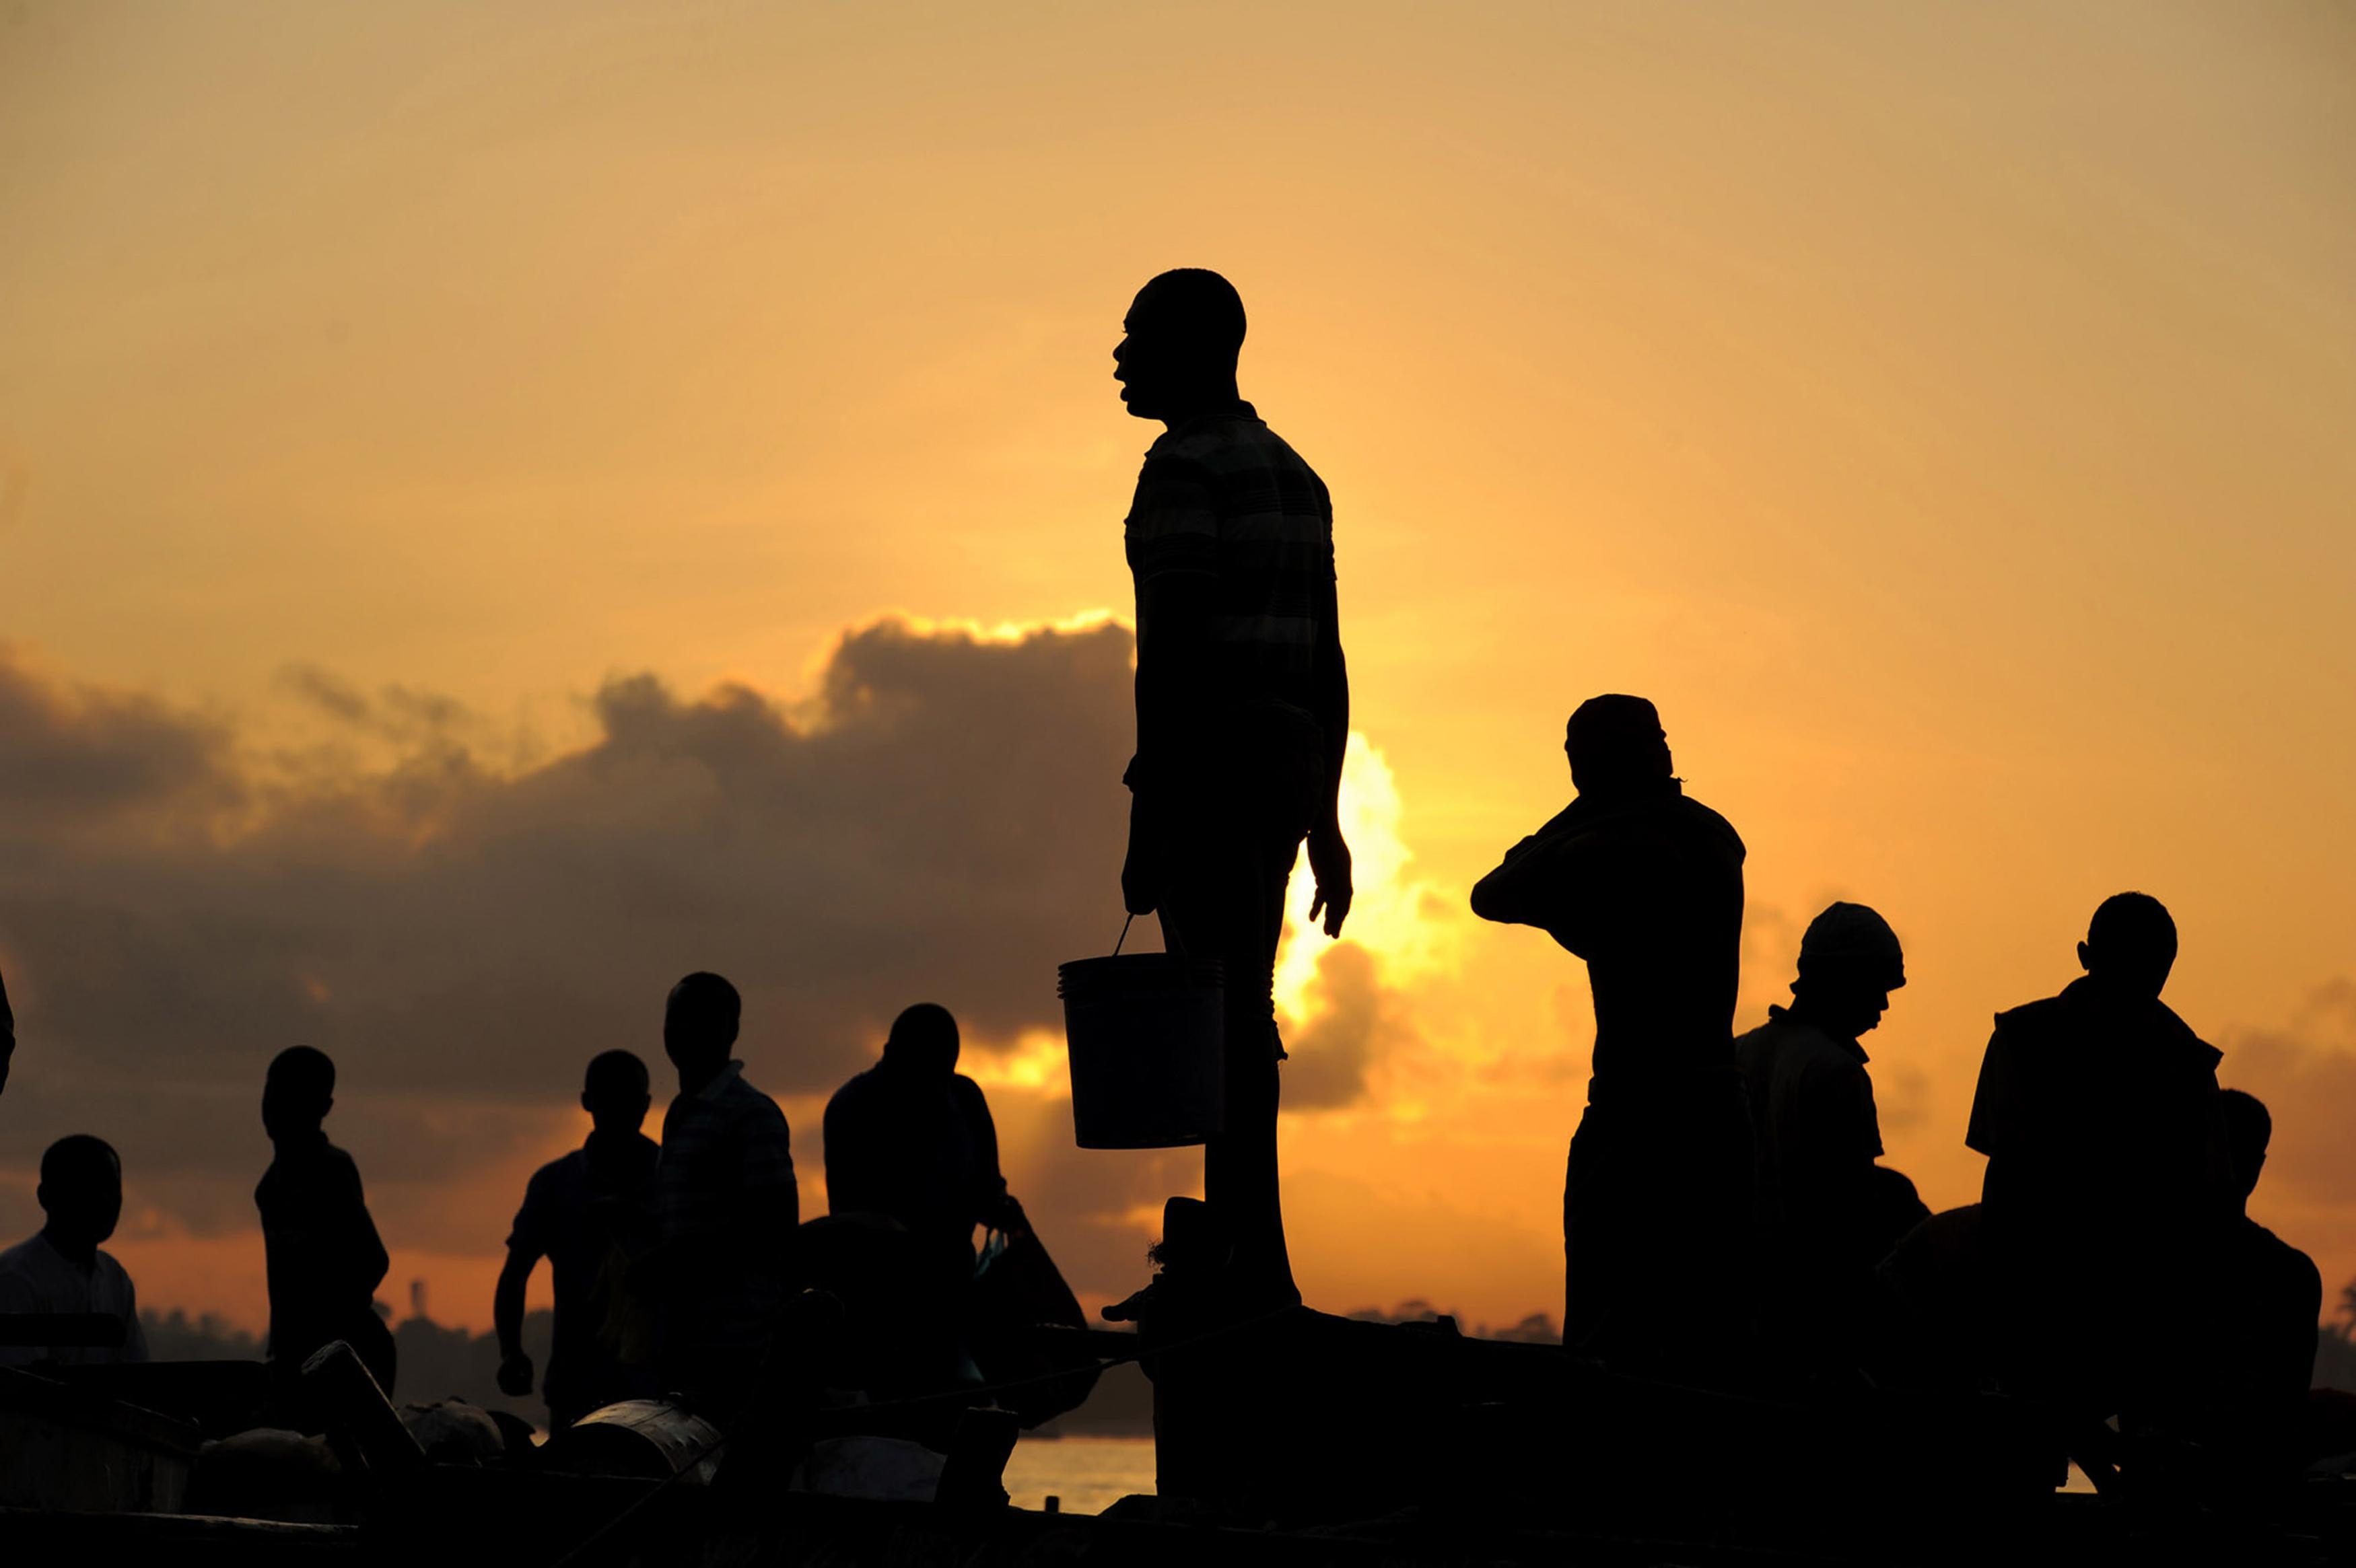 Tanzanian 'Operation Cyclone' Ejects Immigrants, Stirs Xenophobia